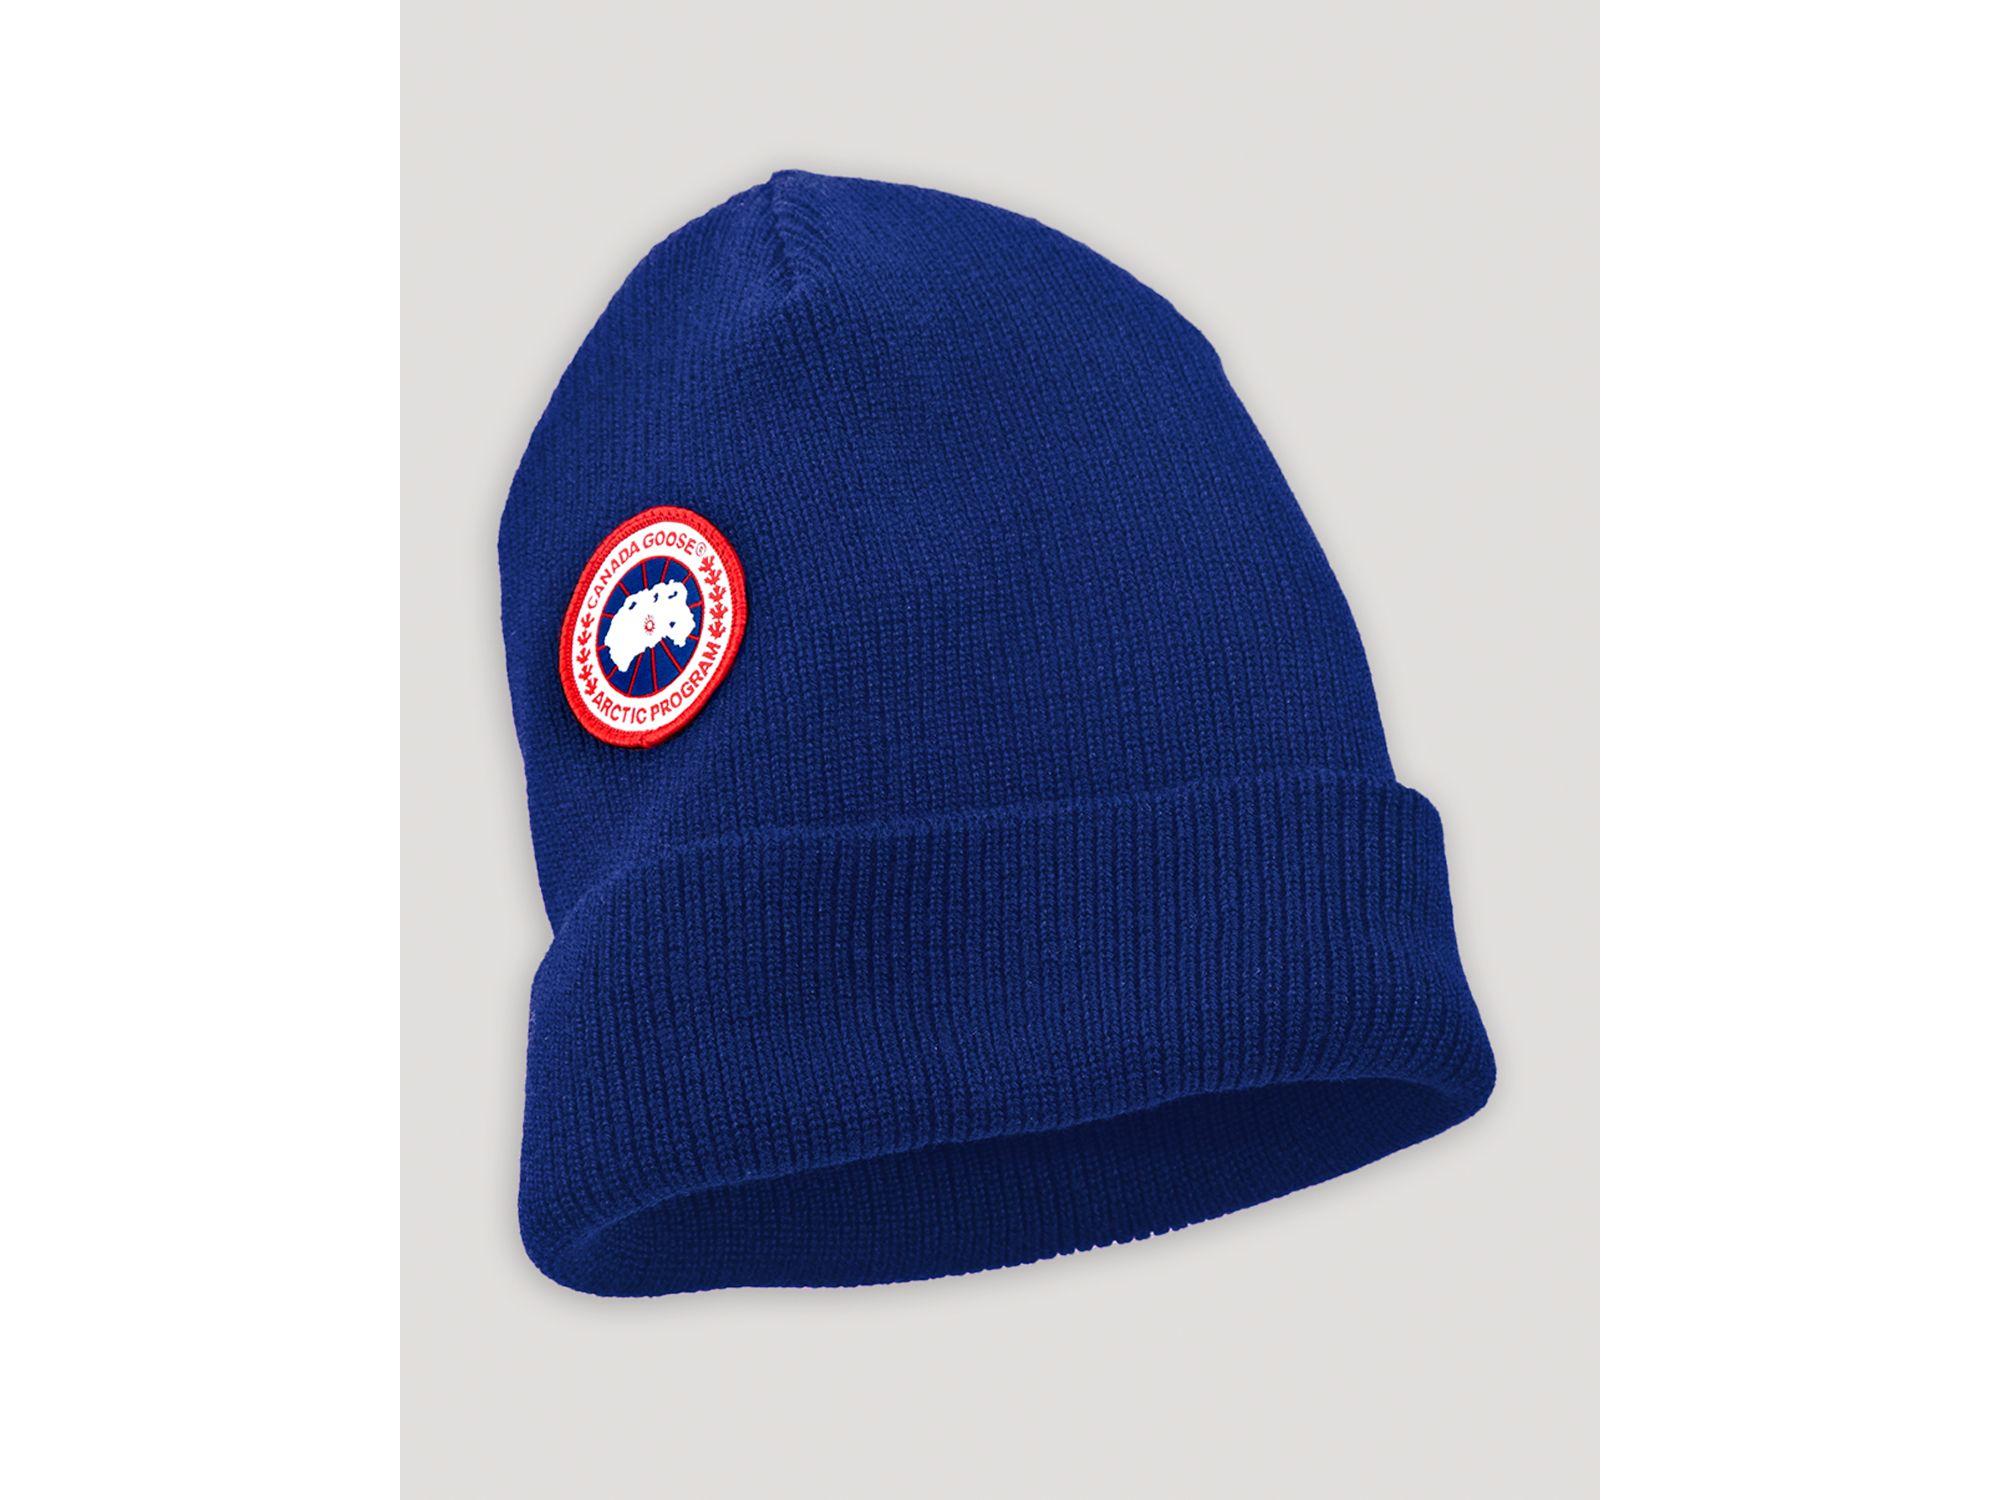 Canada Goose' hats sale 2015